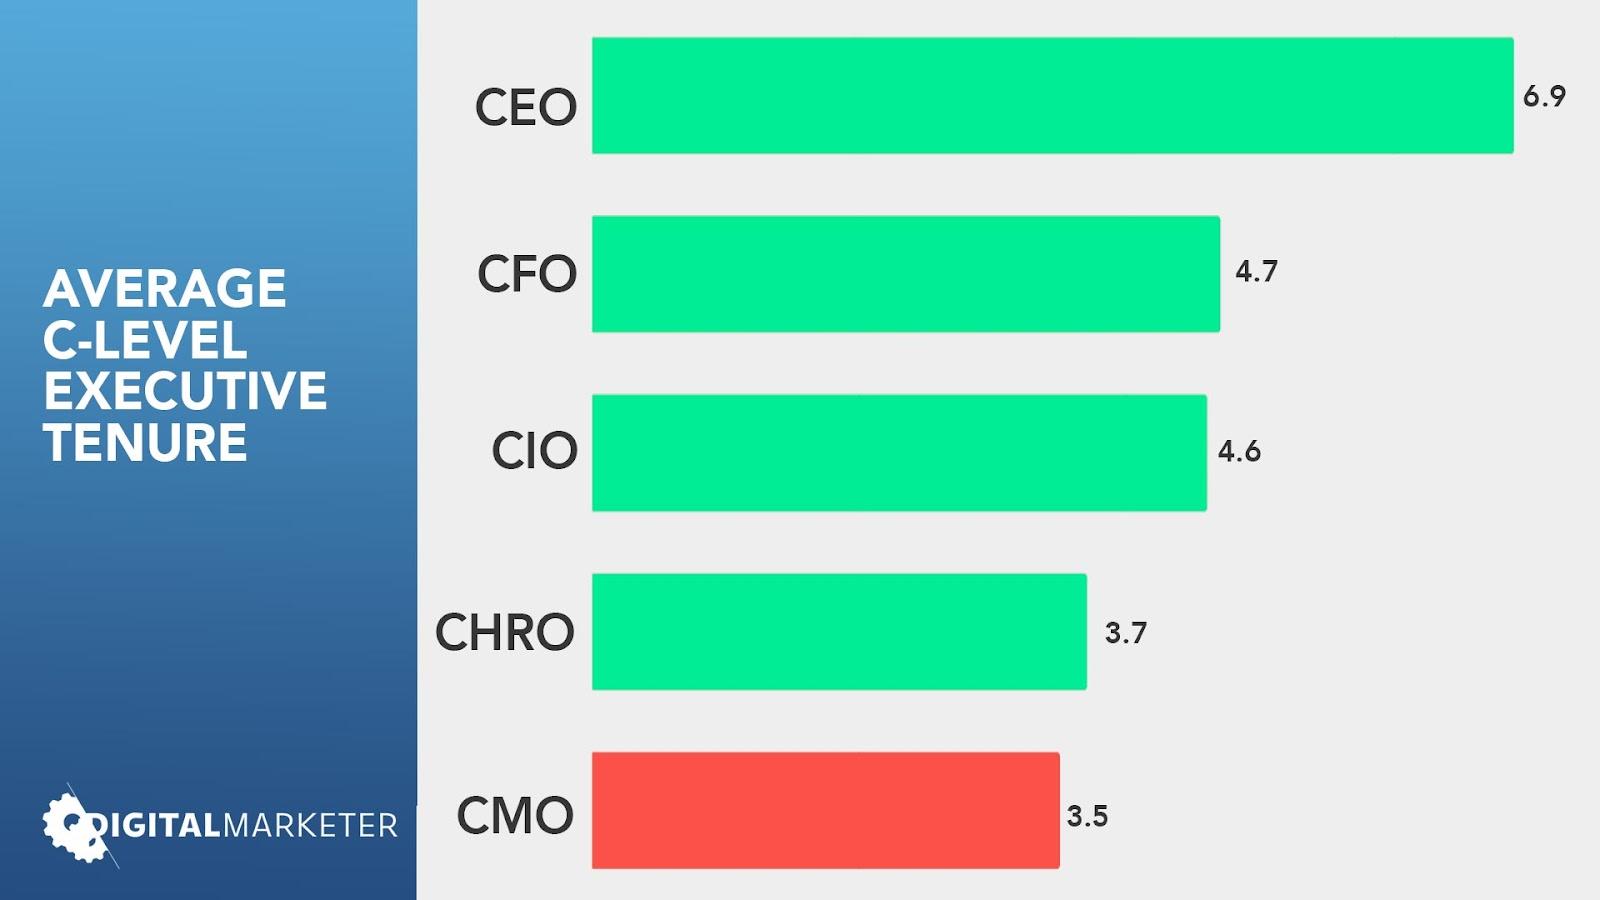 average c-level executive tenure graph